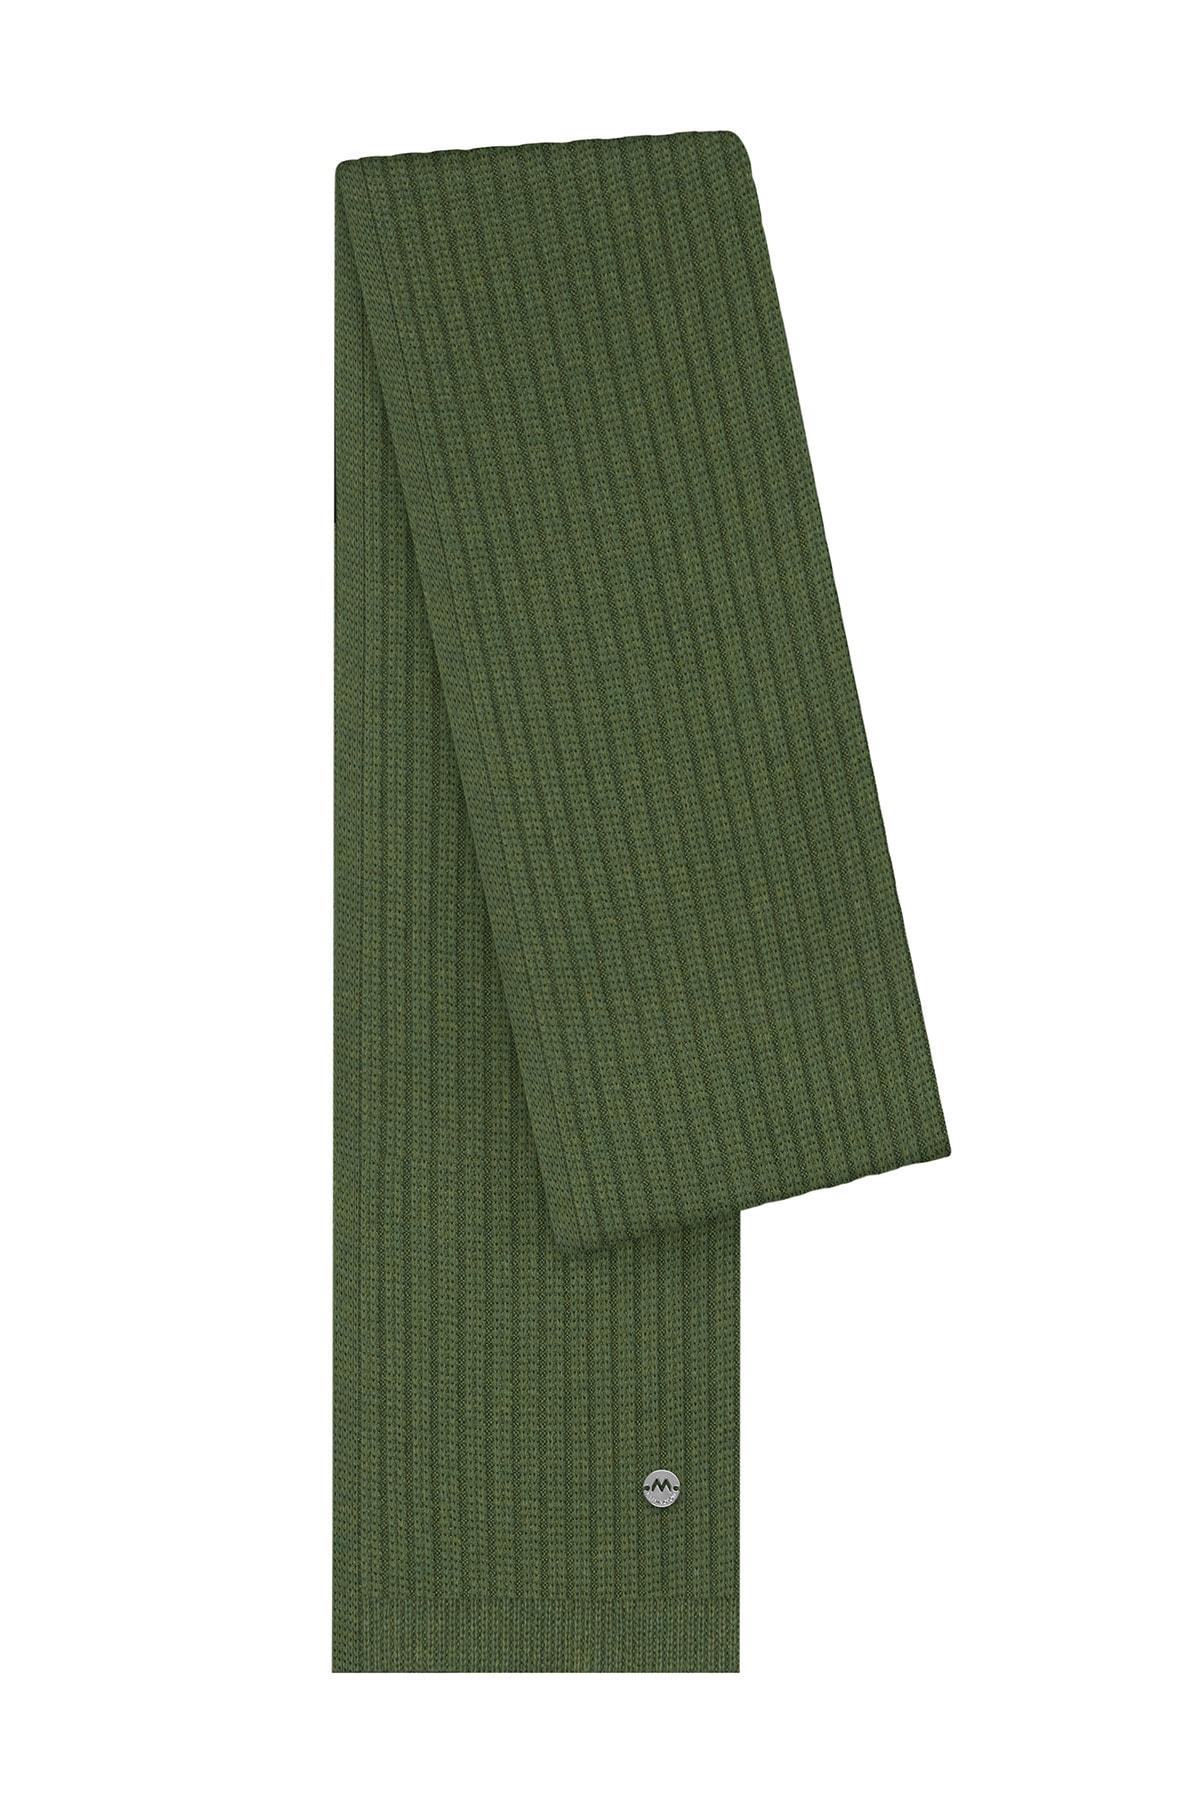 Hemington Koyu Yeşil Merino Yün Atkı 1